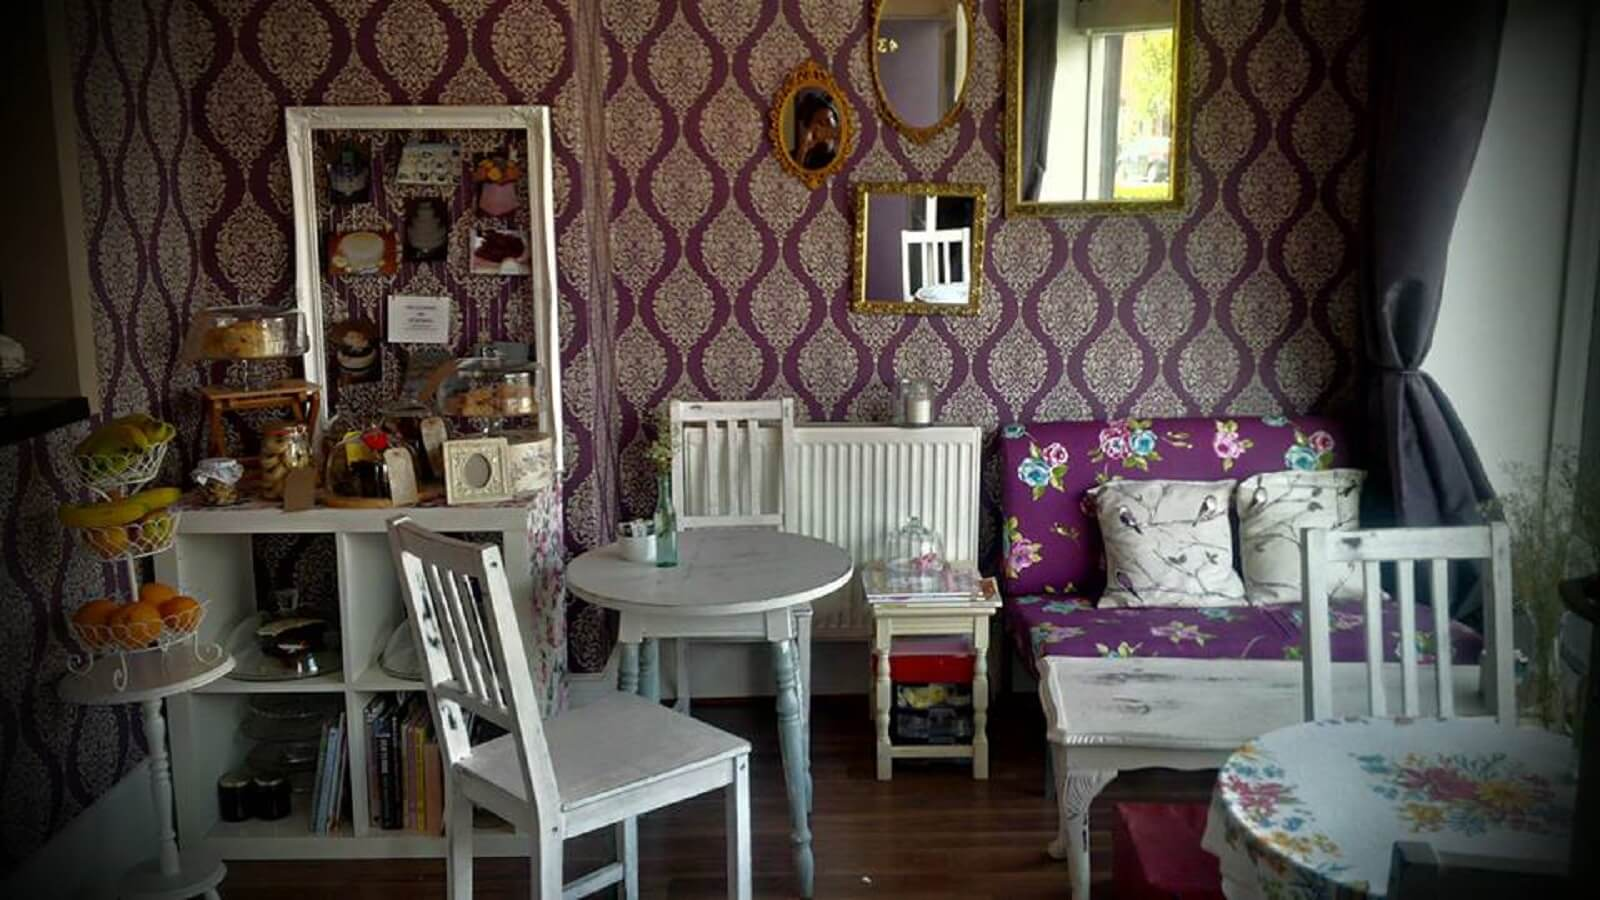 Lia's Cakes & Tearoom